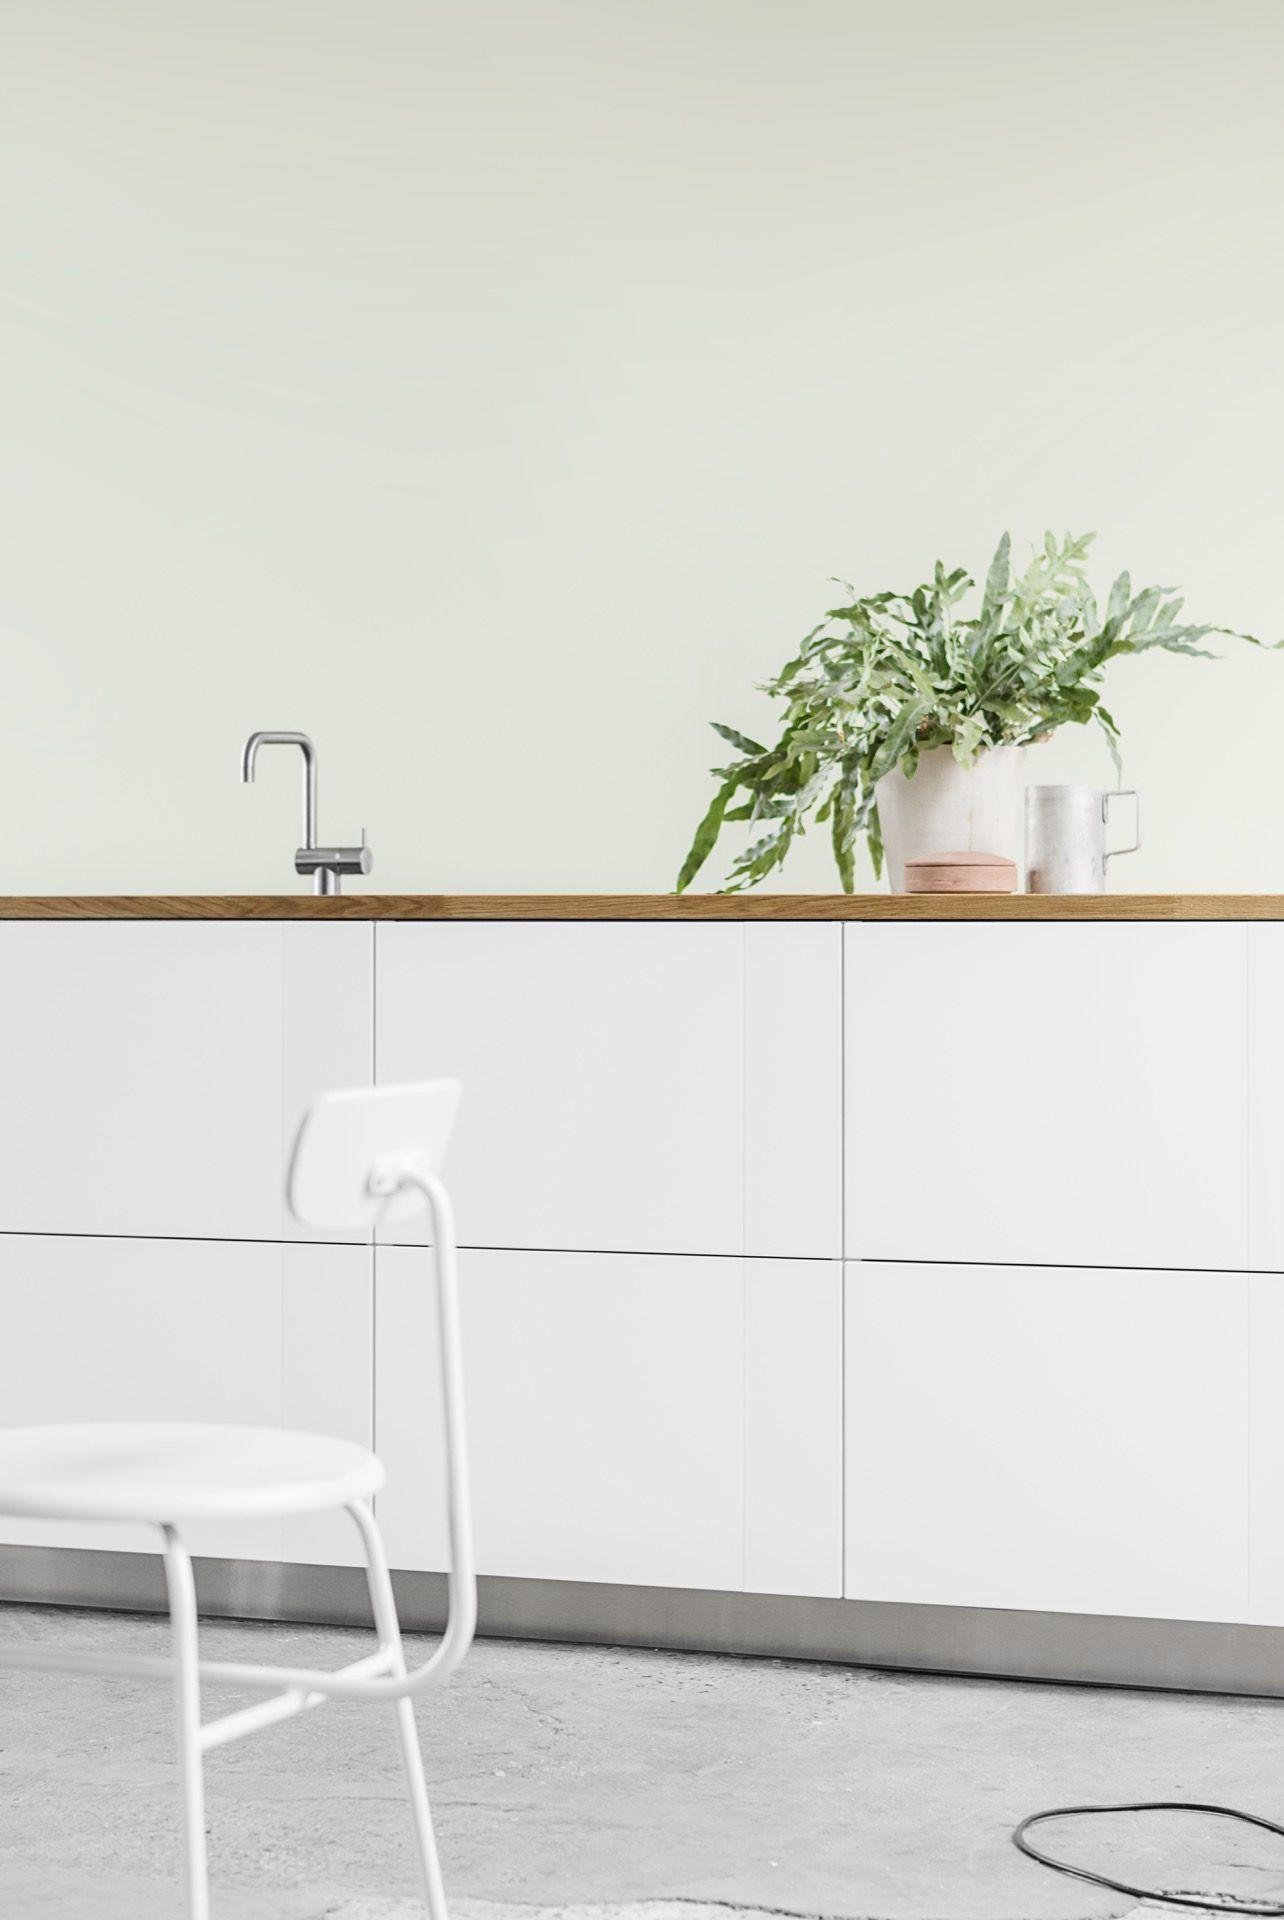 reform ikea fronts product highlight k i t c h e n ikea k che k che k chen inspiration. Black Bedroom Furniture Sets. Home Design Ideas